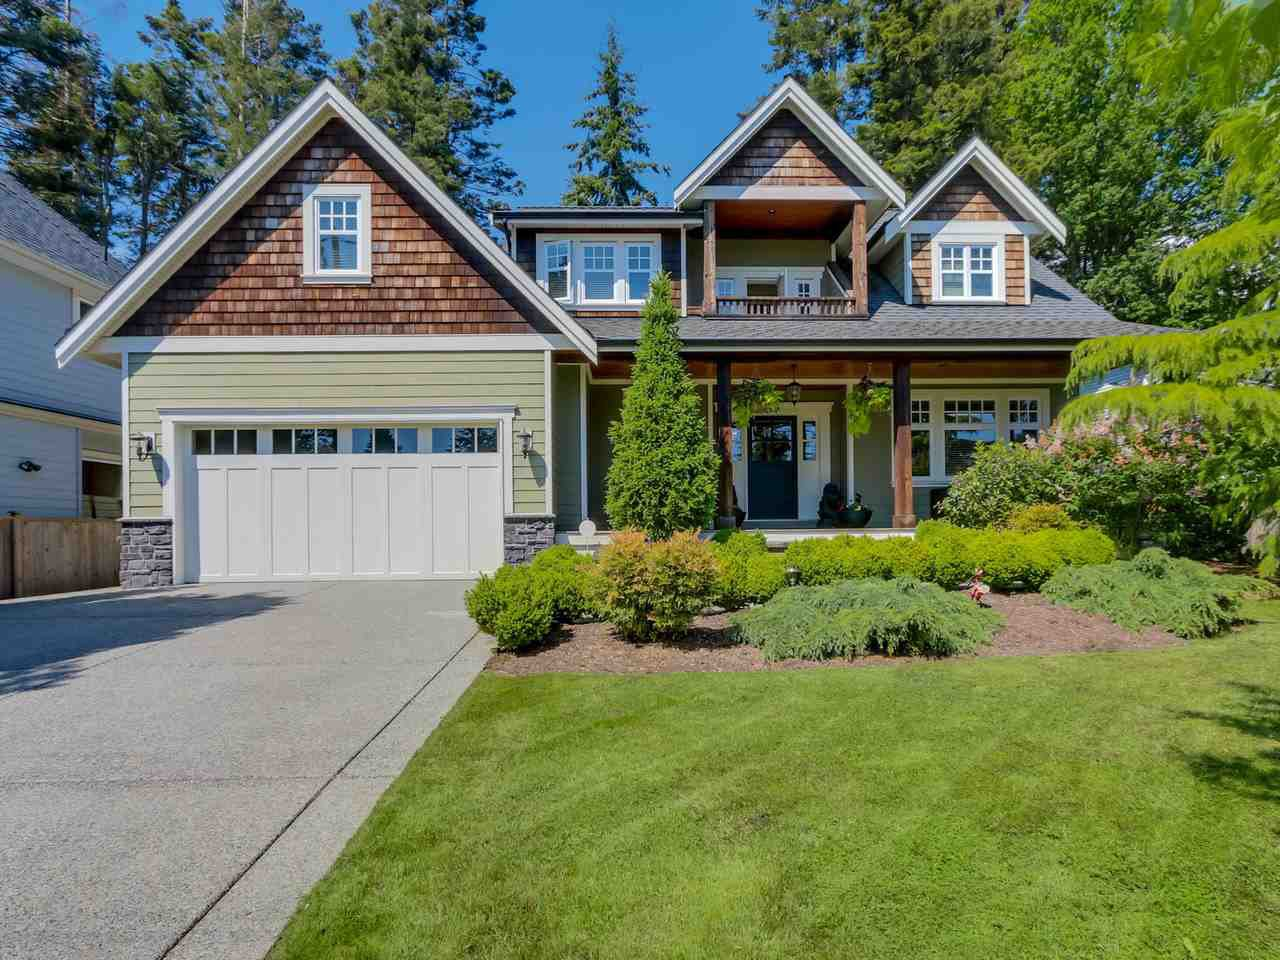 Main Photo: 13029 14 Avenue in Surrey: Crescent Bch Ocean Pk. House for sale (South Surrey White Rock)  : MLS®# R2070160